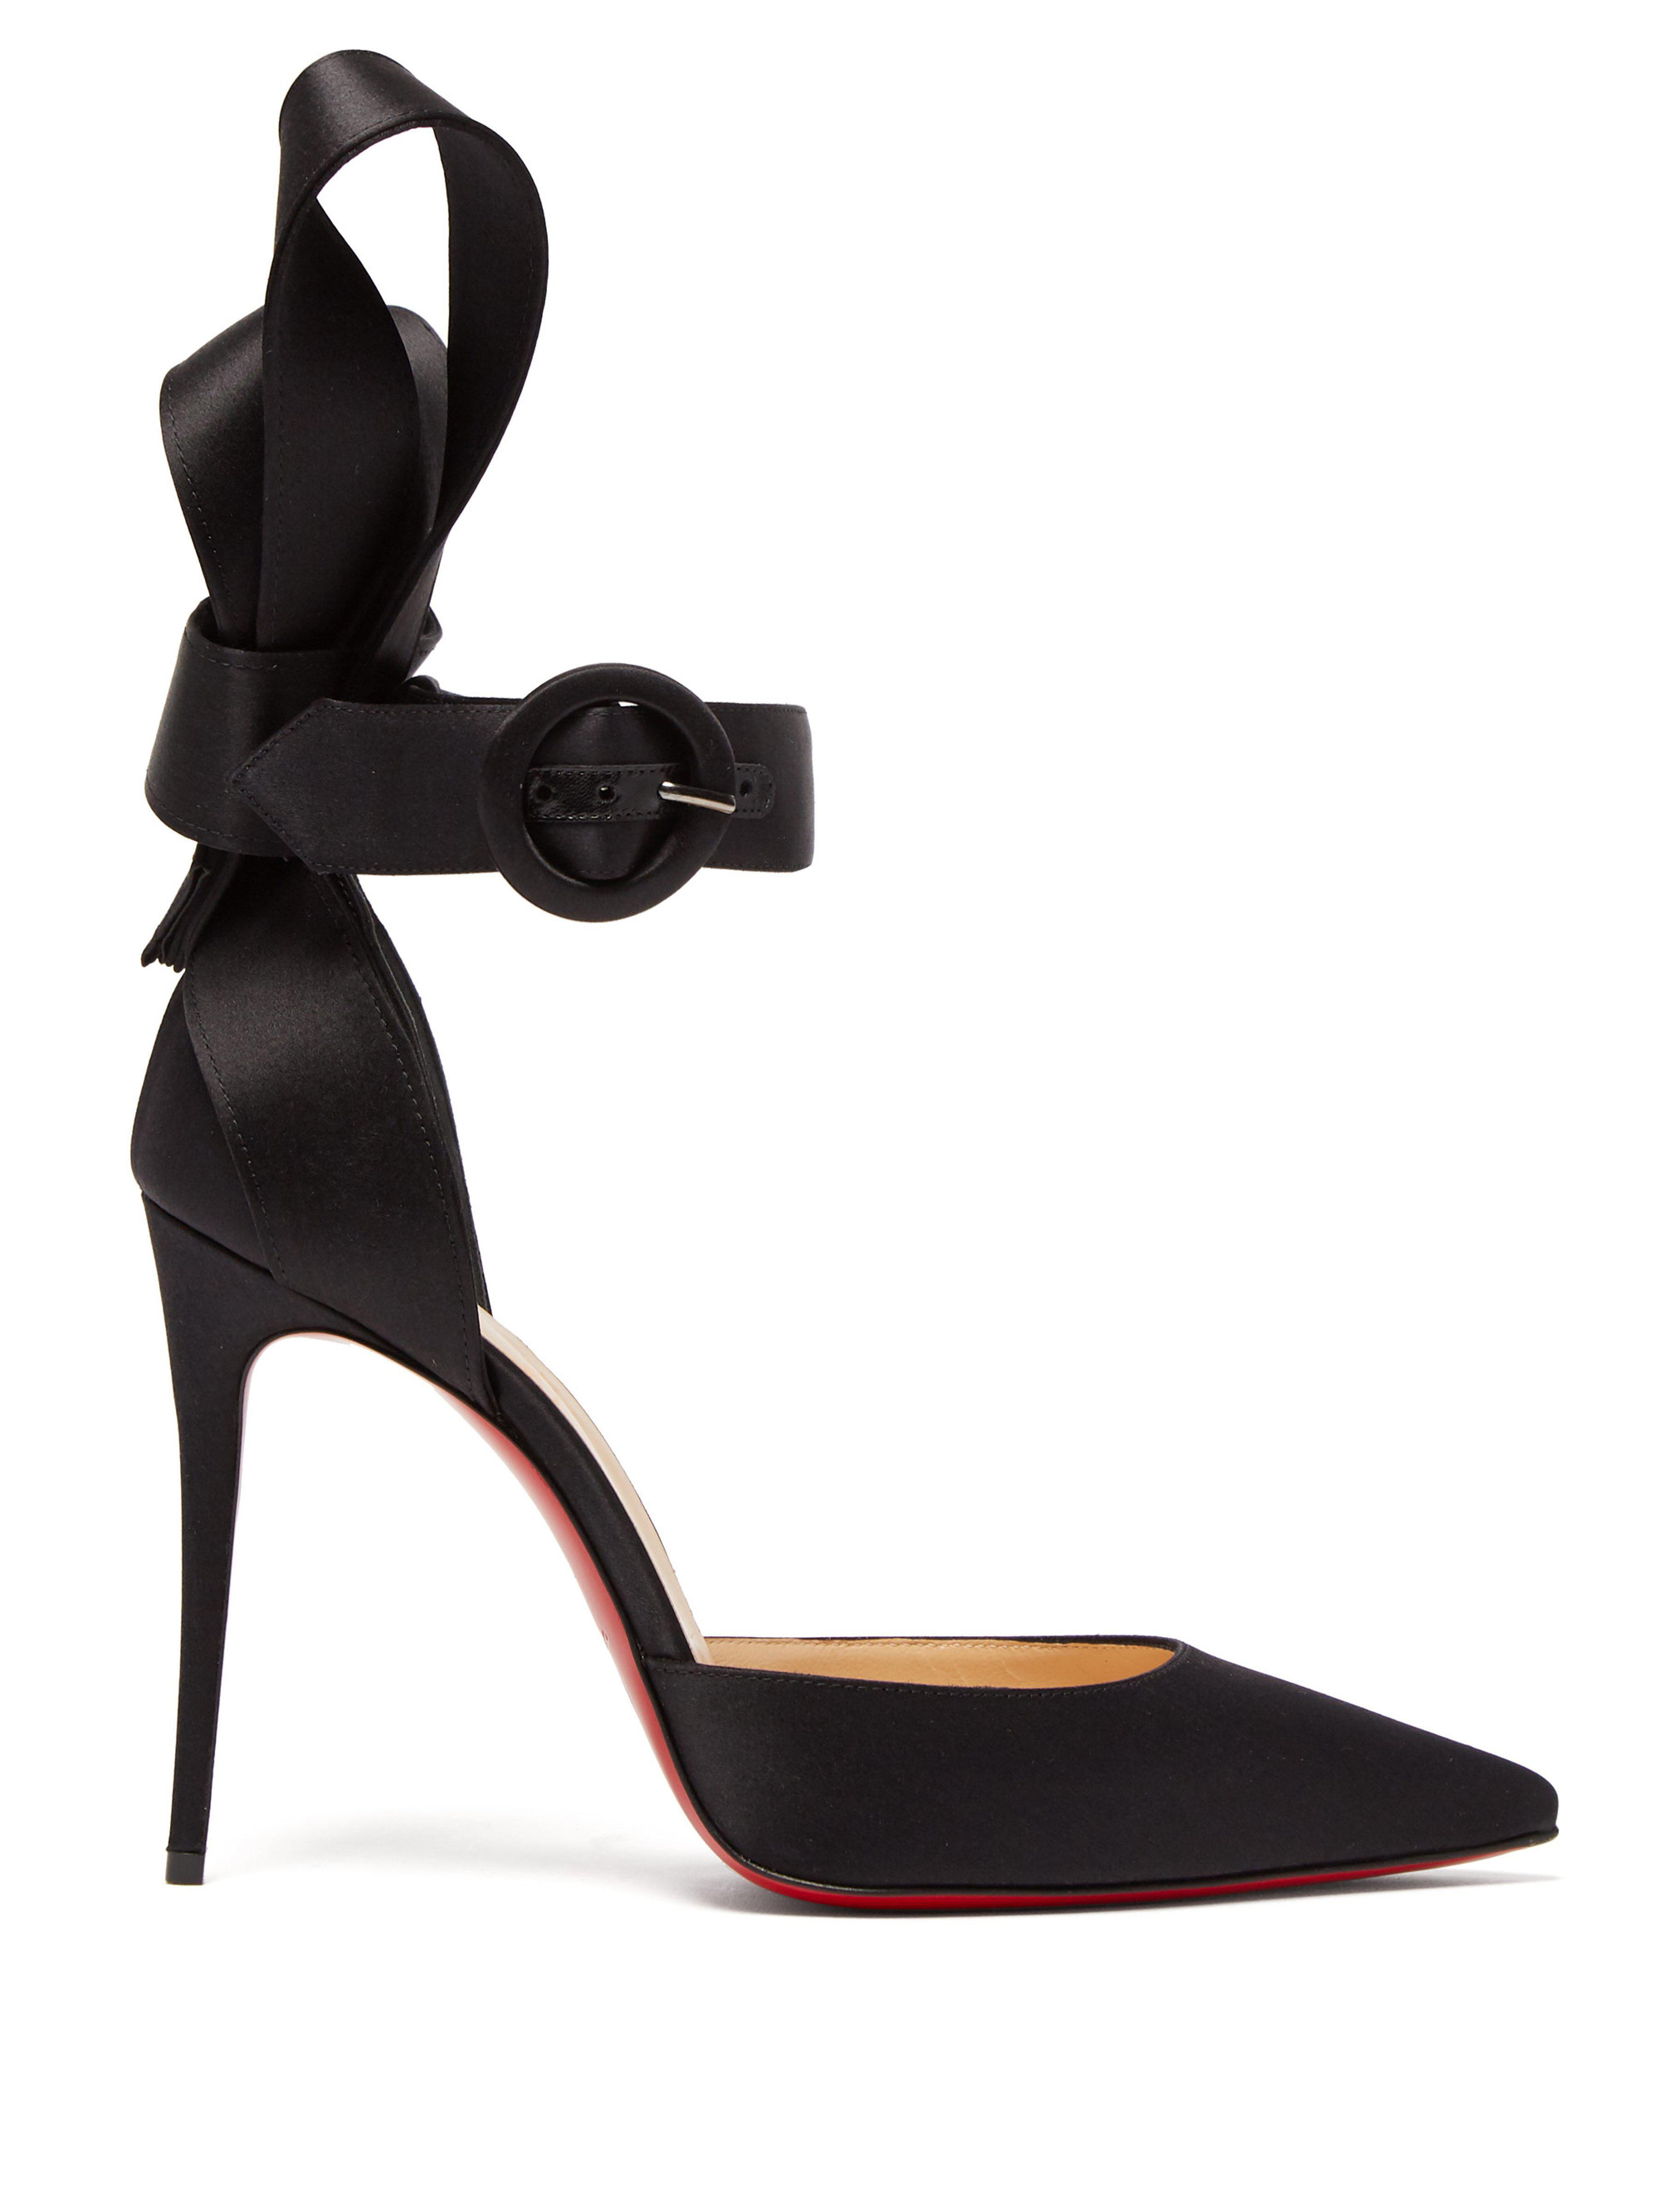 cc3e8cc5899 Christian Louboutin. Women s Black Raissa 100 Bow Back Satin Court Shoes